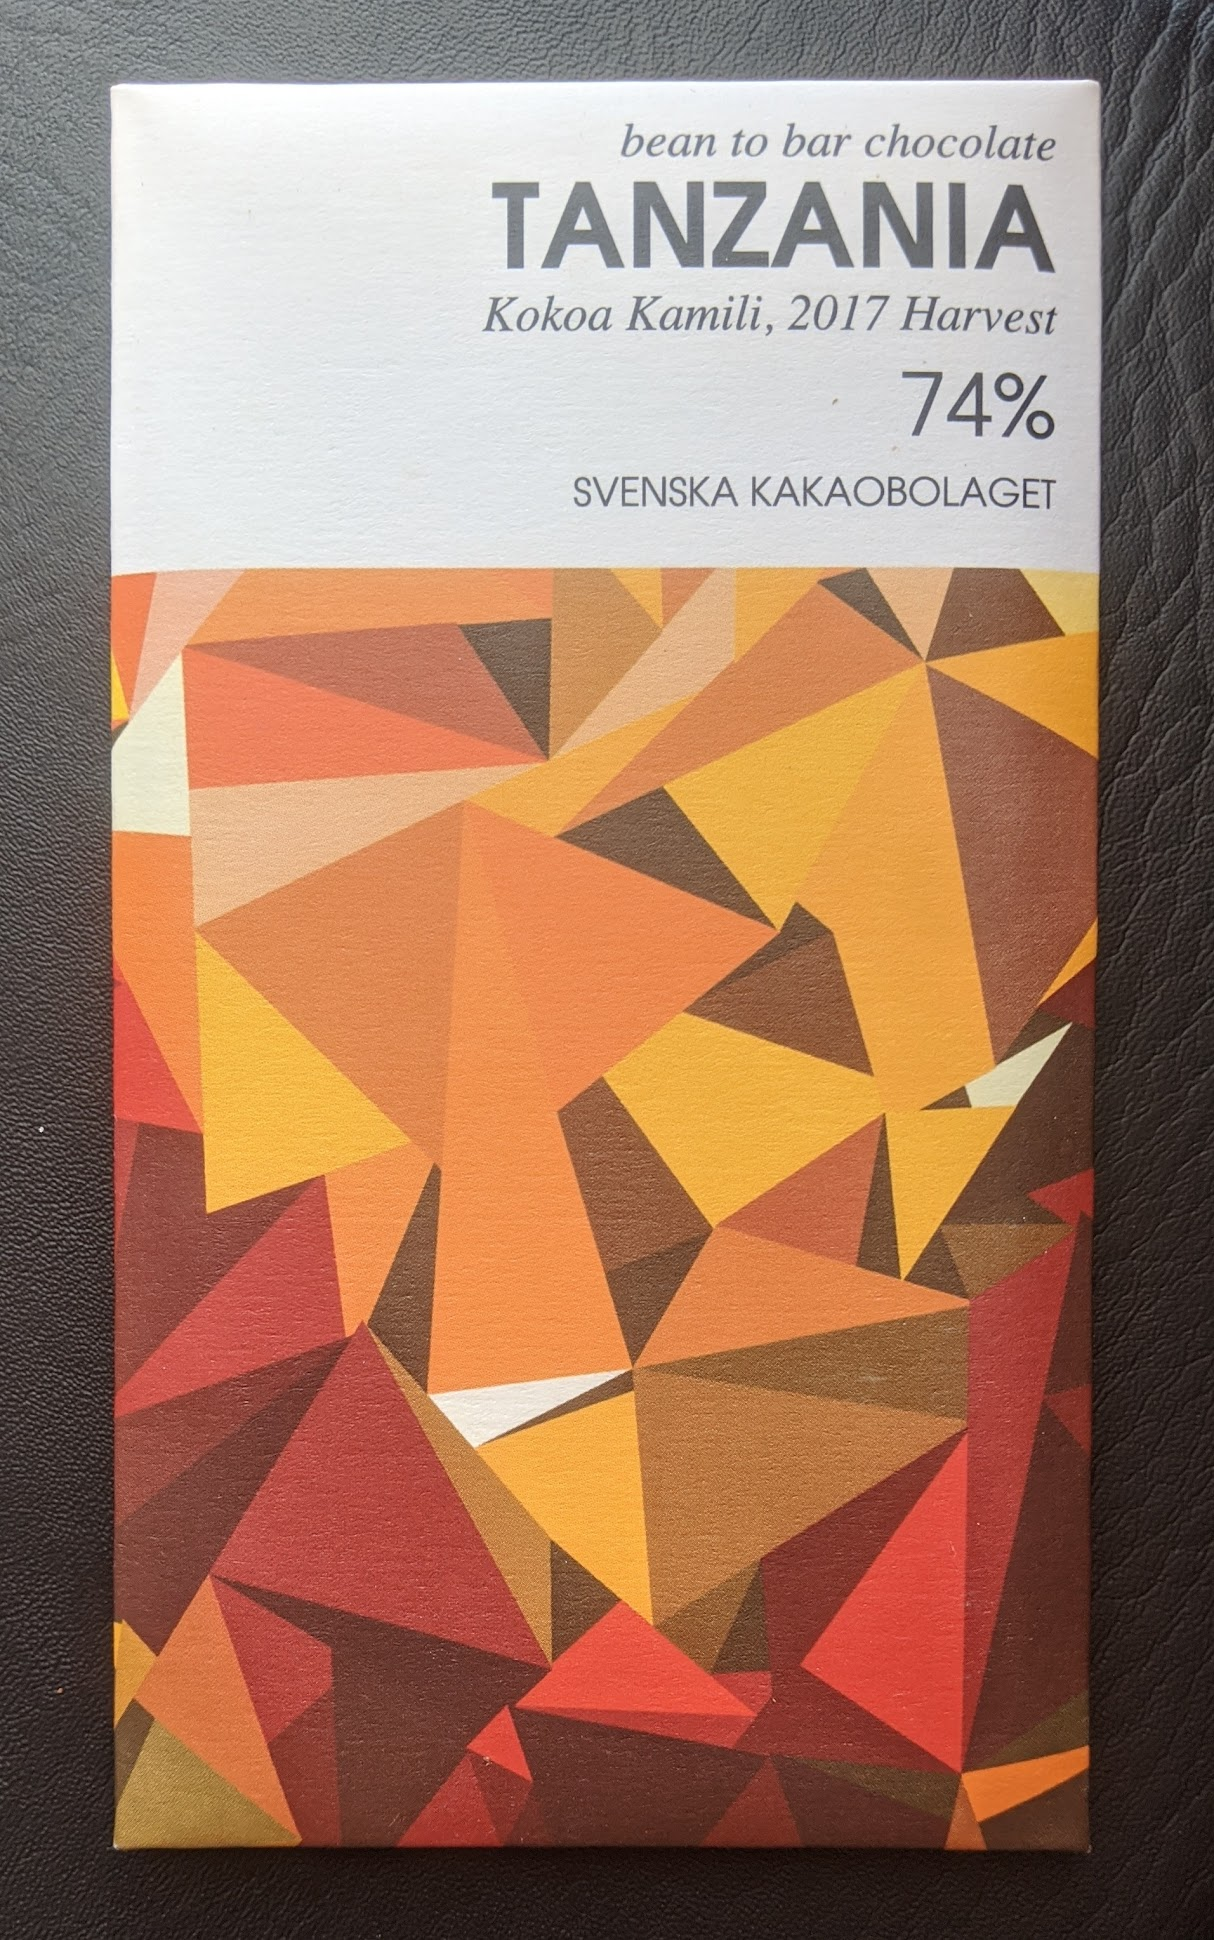 74% svenska tanzania bar